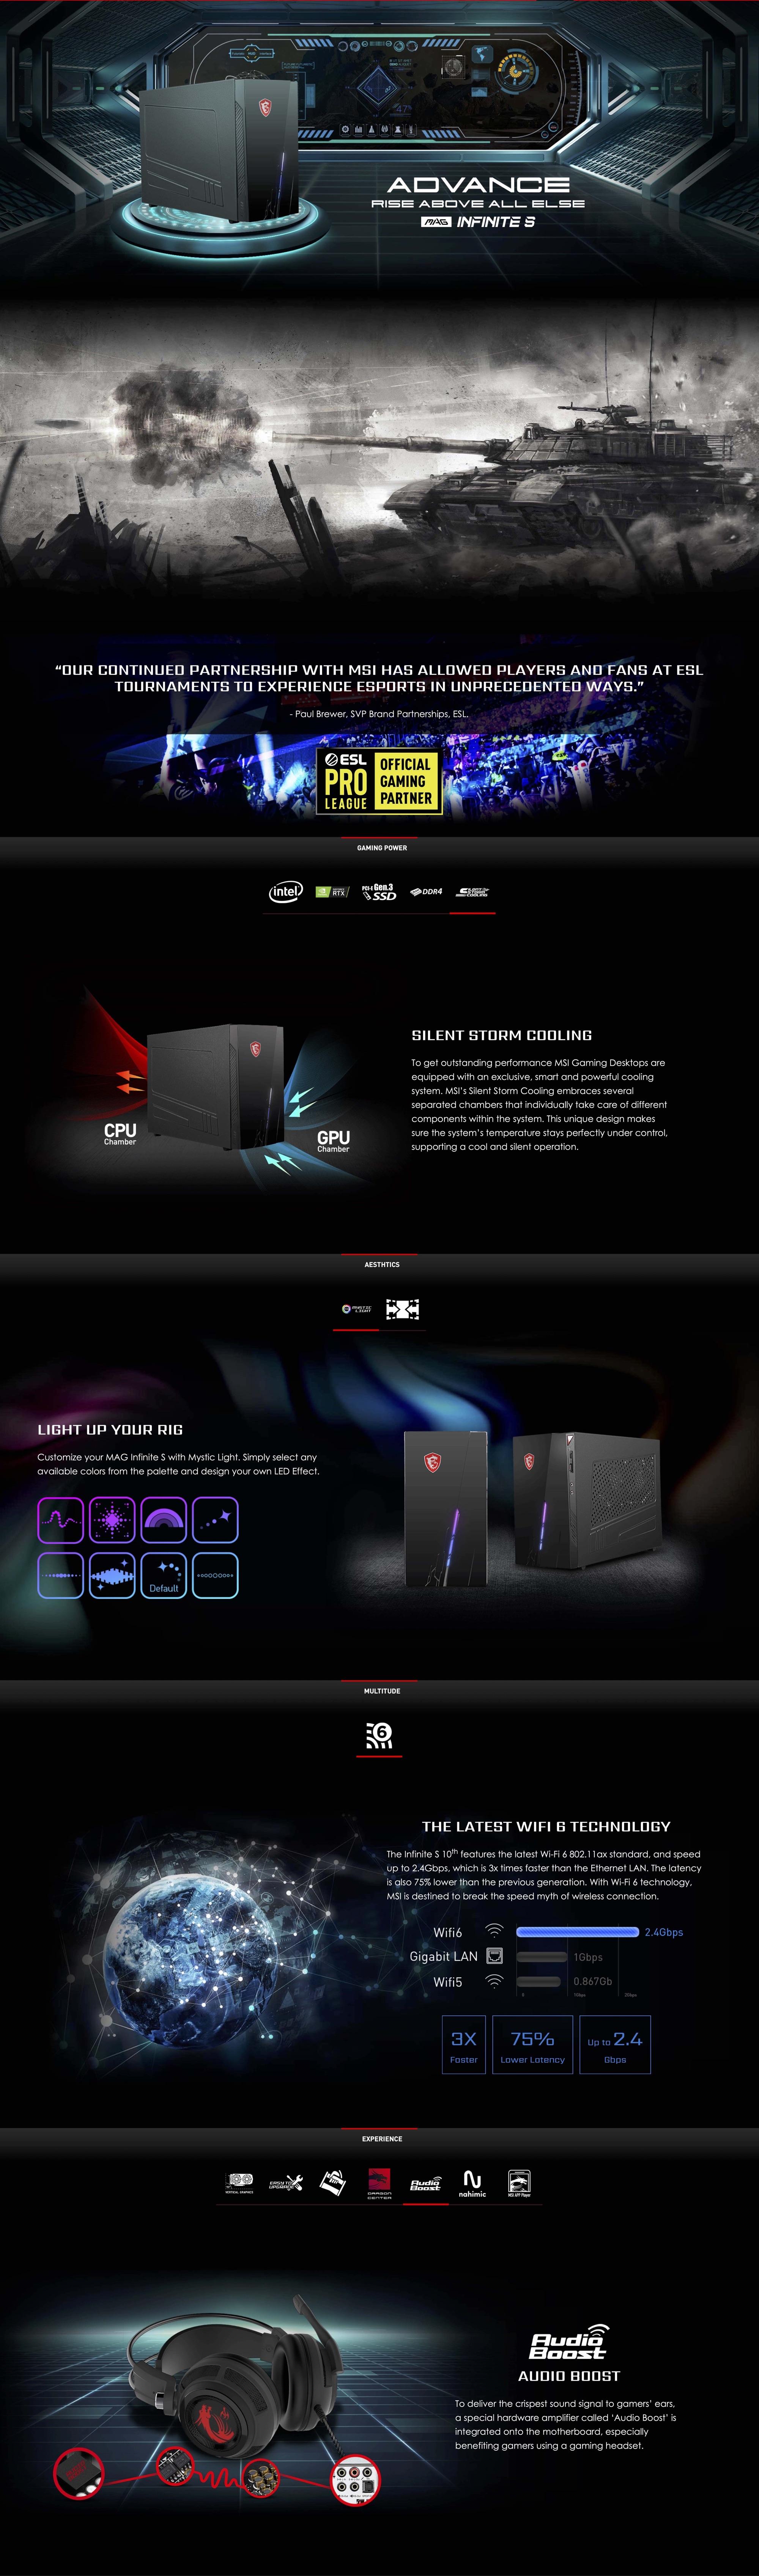 MSI Infinite S 10th | Gaming Desktop | The Compact Conqueror | Description